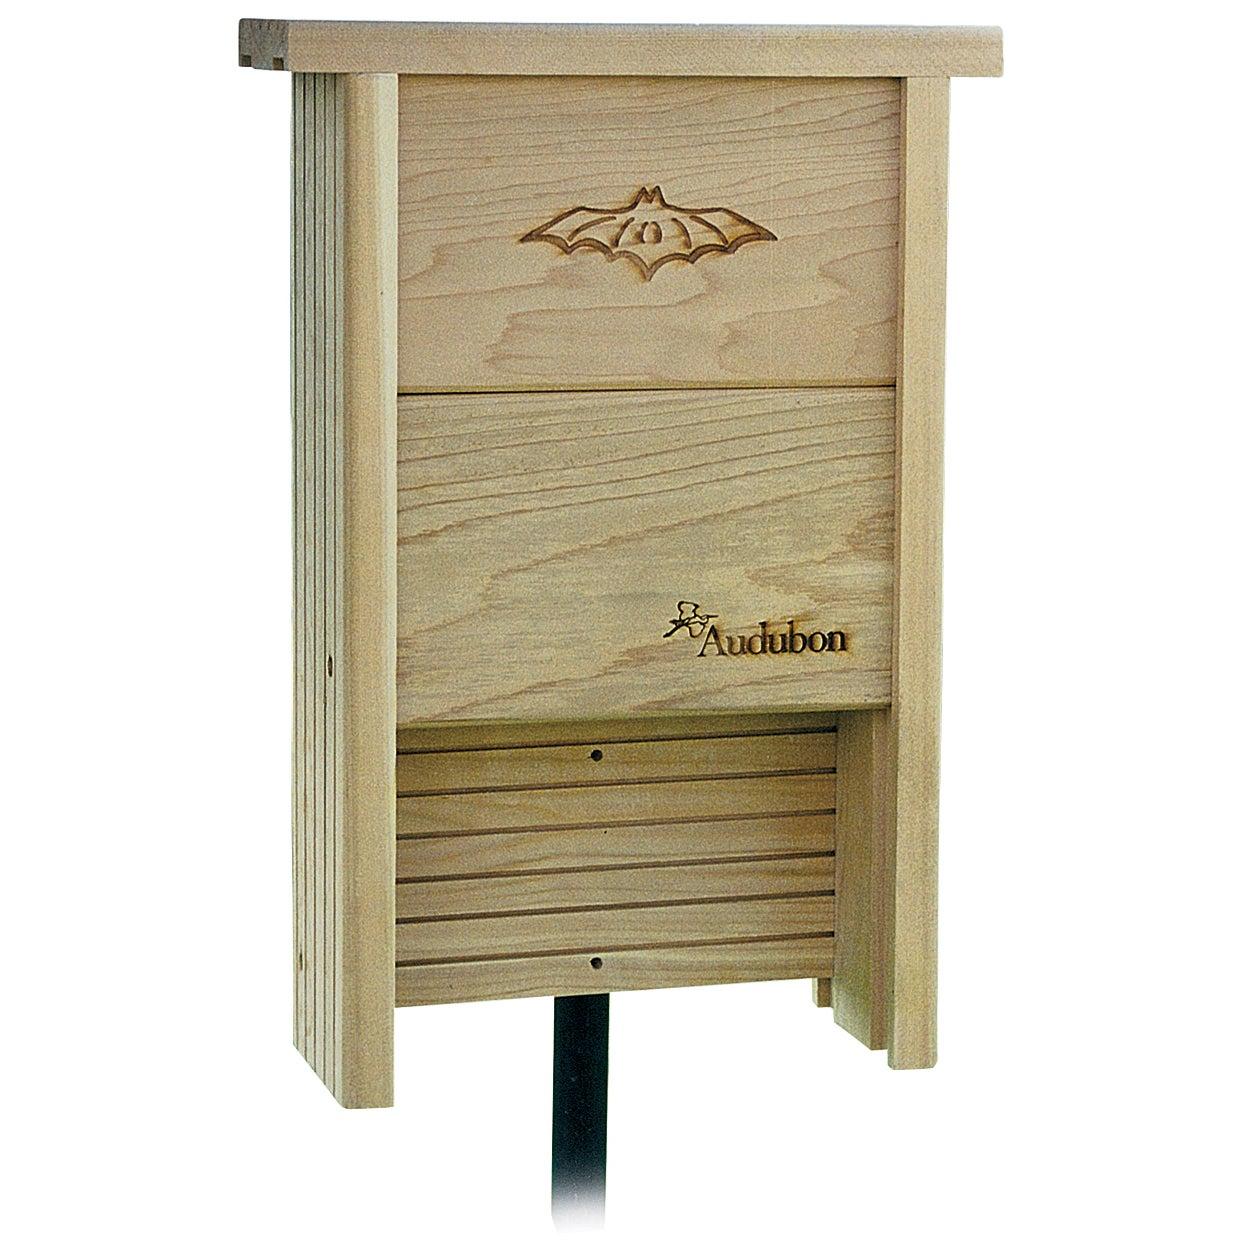 "Woodlink Audubon Nabat 14.25"" L x 3.5"" D x 15.25"" H Cedar..."